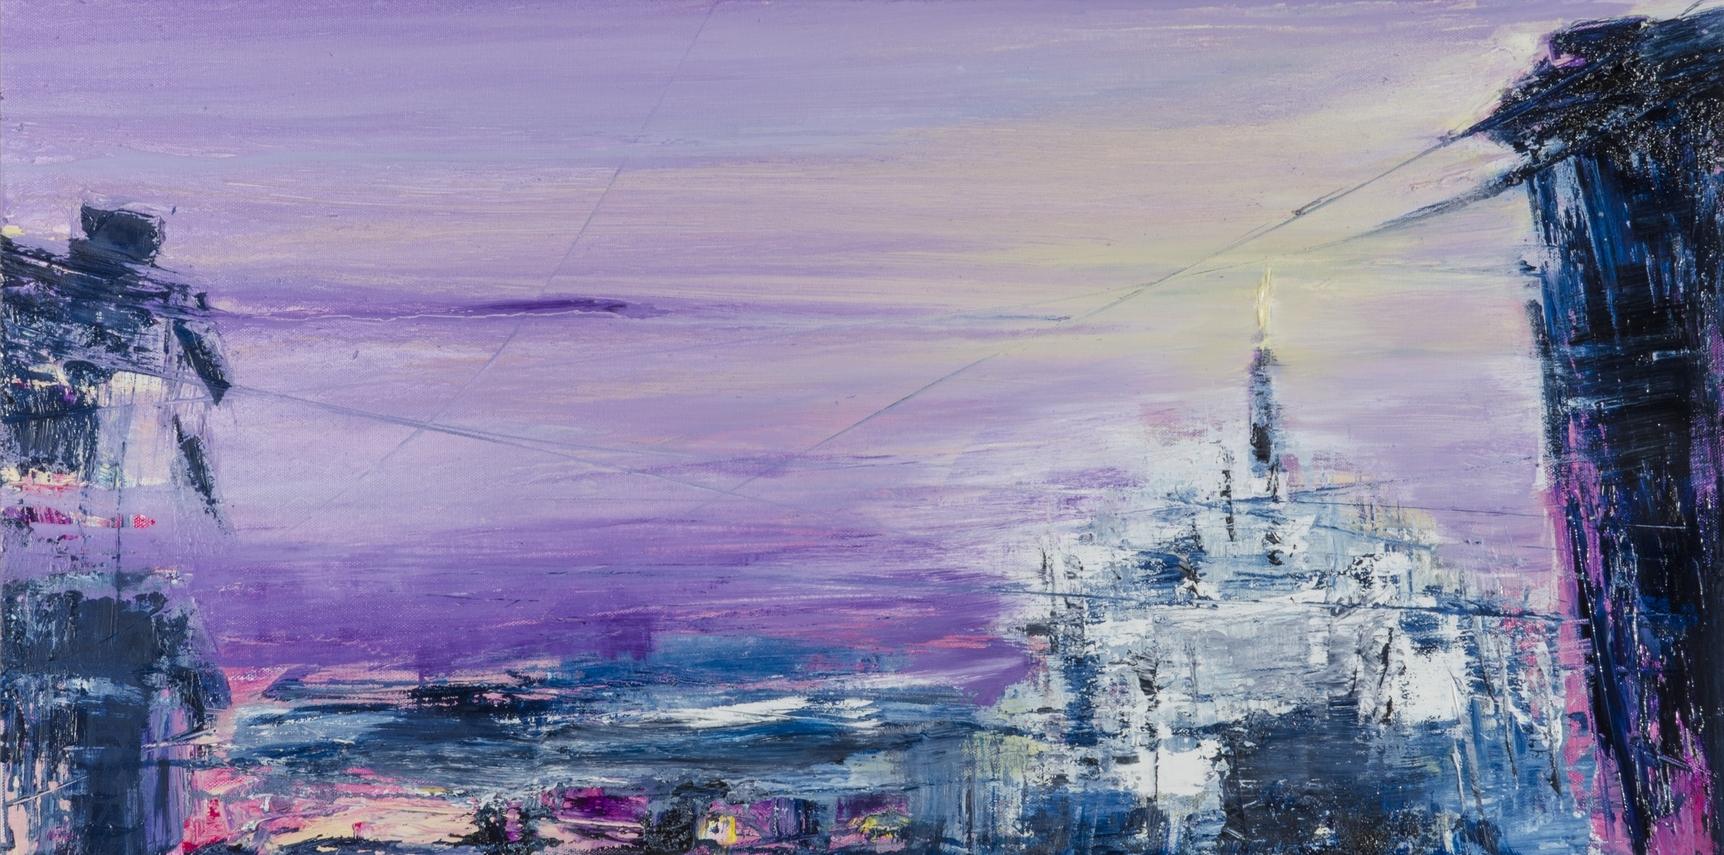 2017 Luci serali 40x80cm-oil-on-canvas